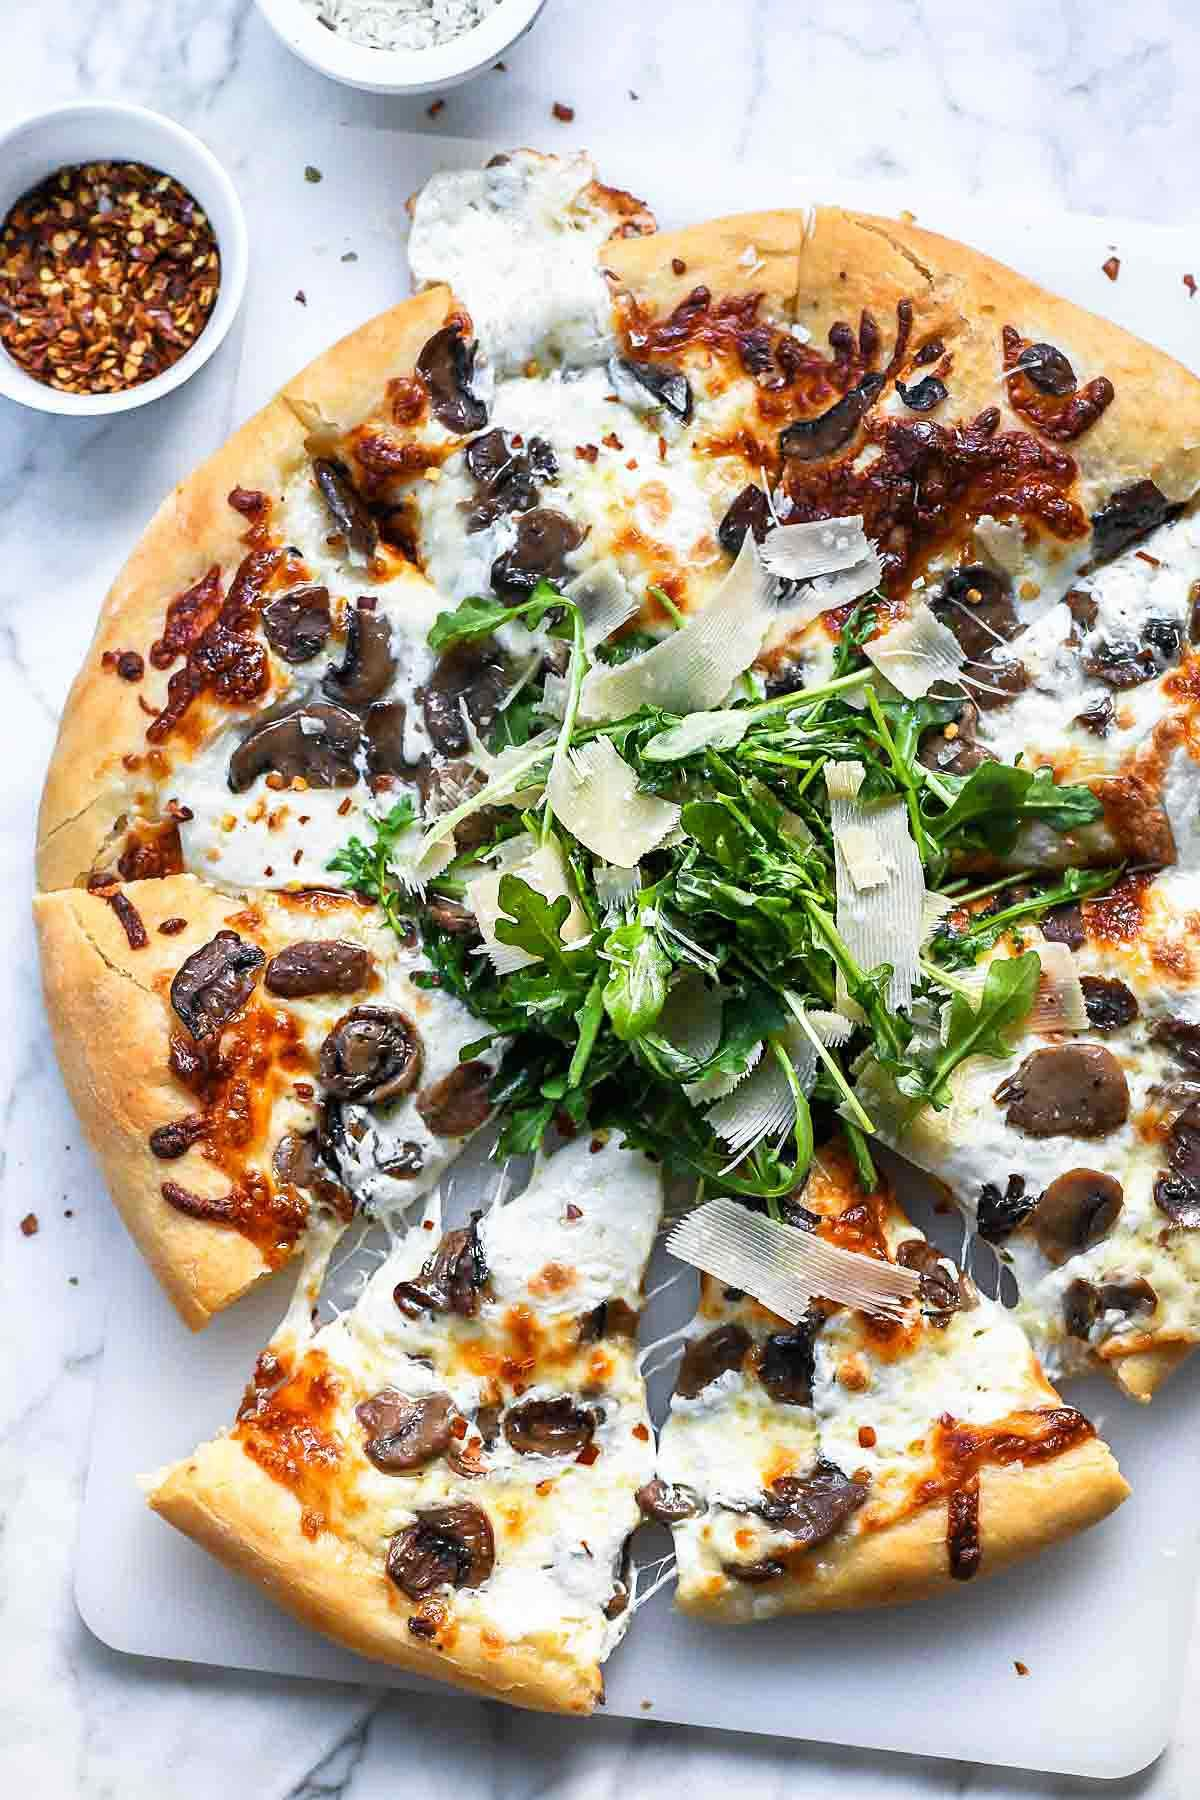 Truffled Mushroom Pizza Foodiecrush Com Pizza Truffles Mushrooms Recipes Pizza Recipes Homemade Mushroom Pizza Recipes Mushroom Pizza